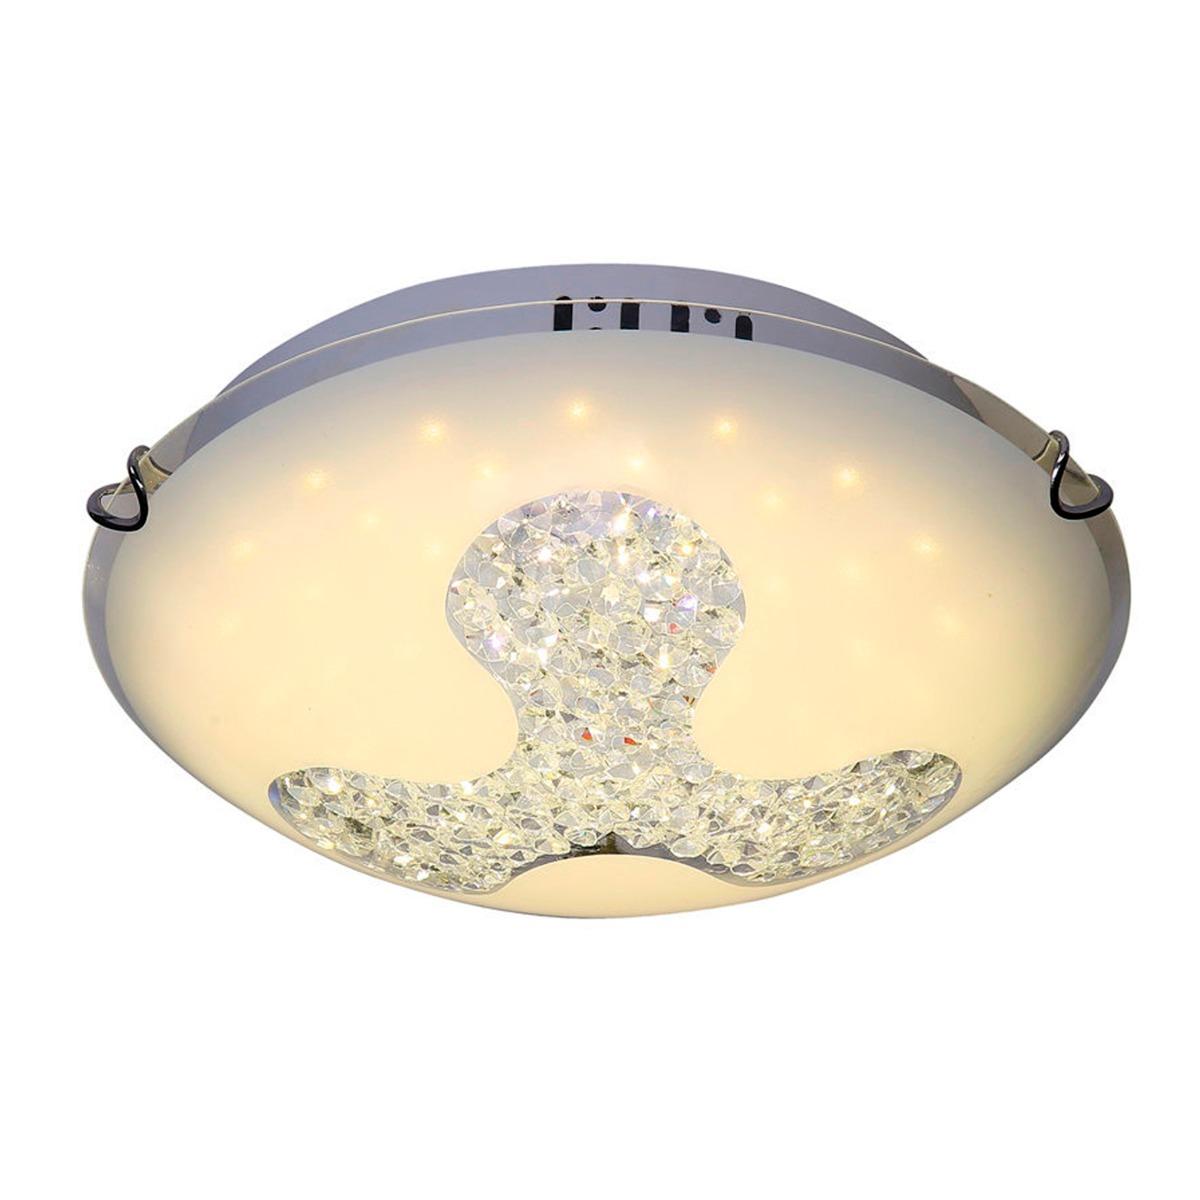 Lámpara Techo Led Redonda Interior Luz Blanca Decoración ...